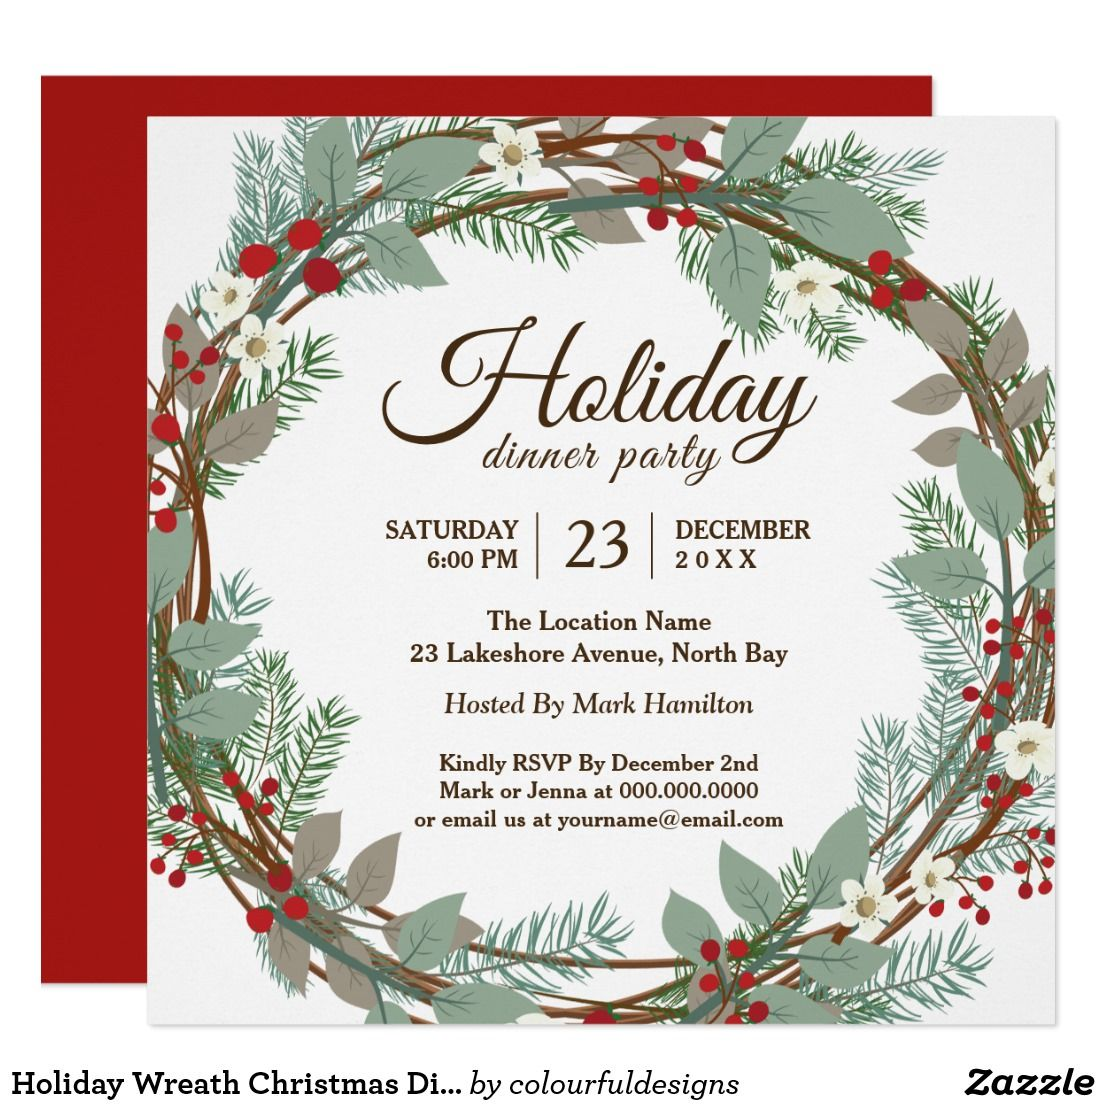 Holiday Wreath Christmas Dinner Party Invitation | Christmas Cards ...